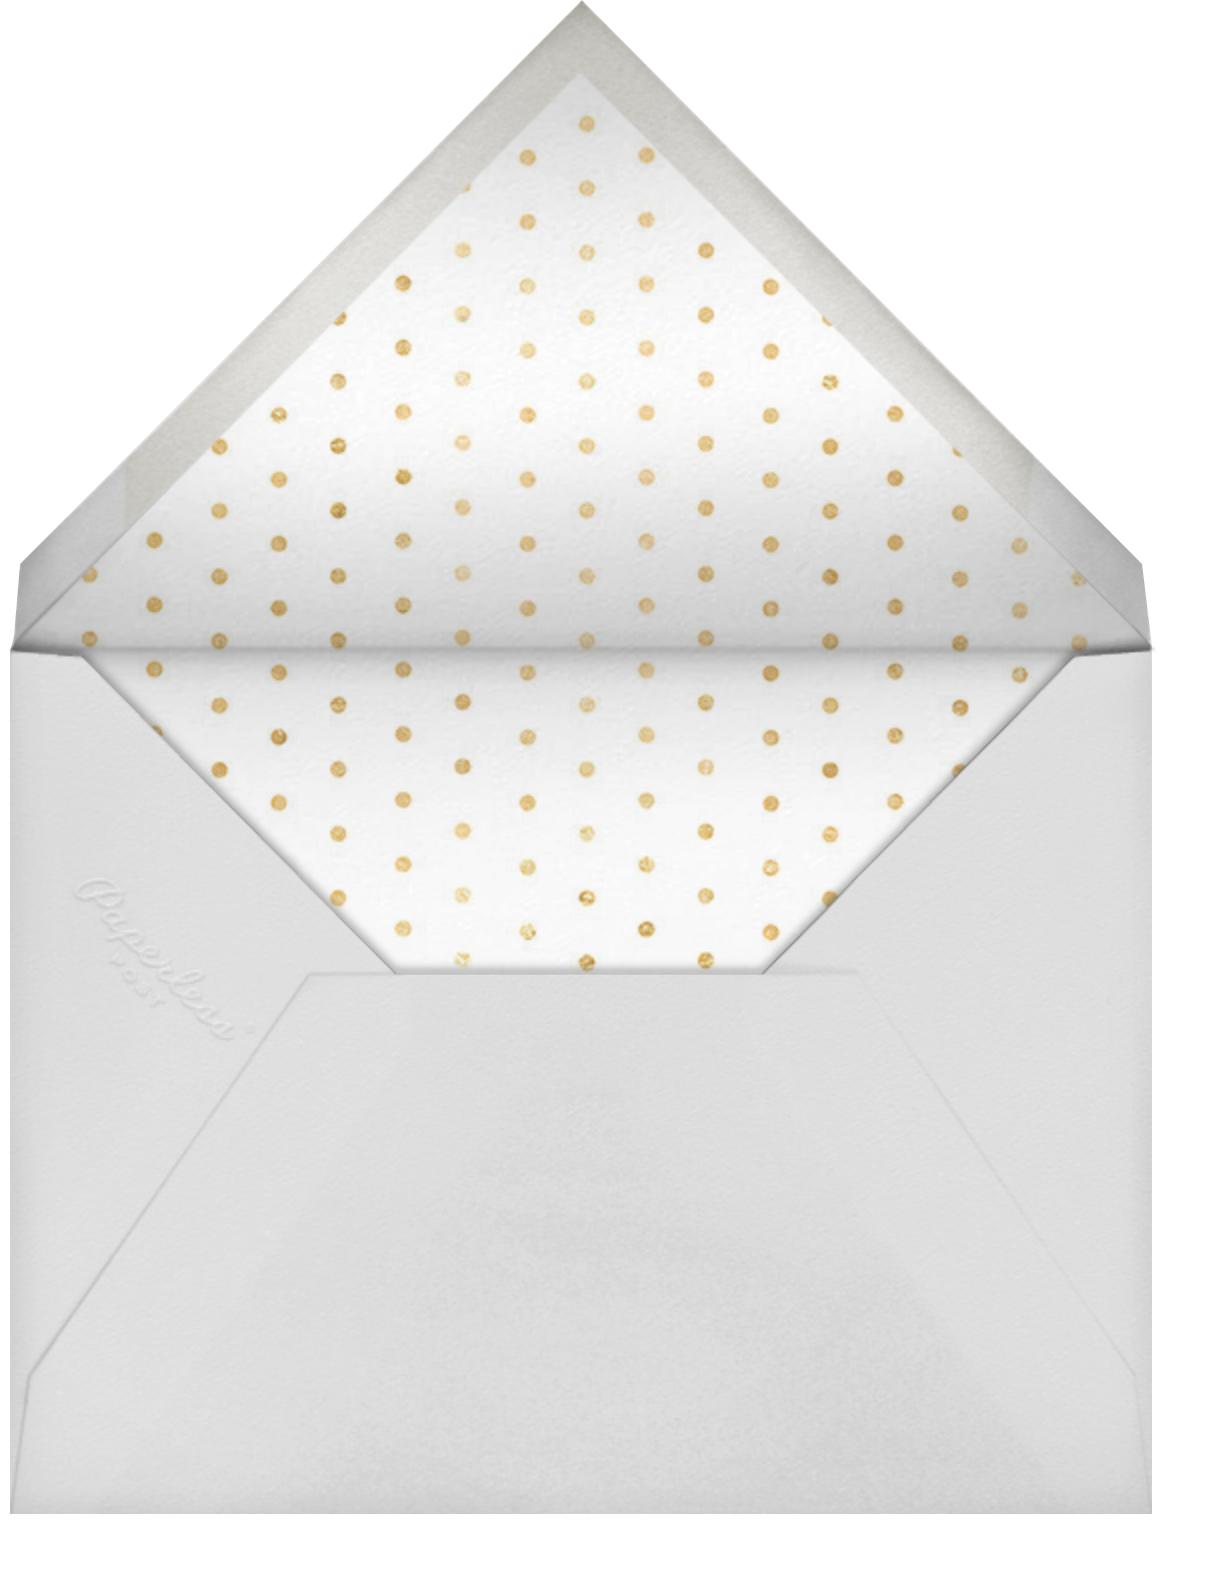 Chelsea - Sugar Paper - Envelope